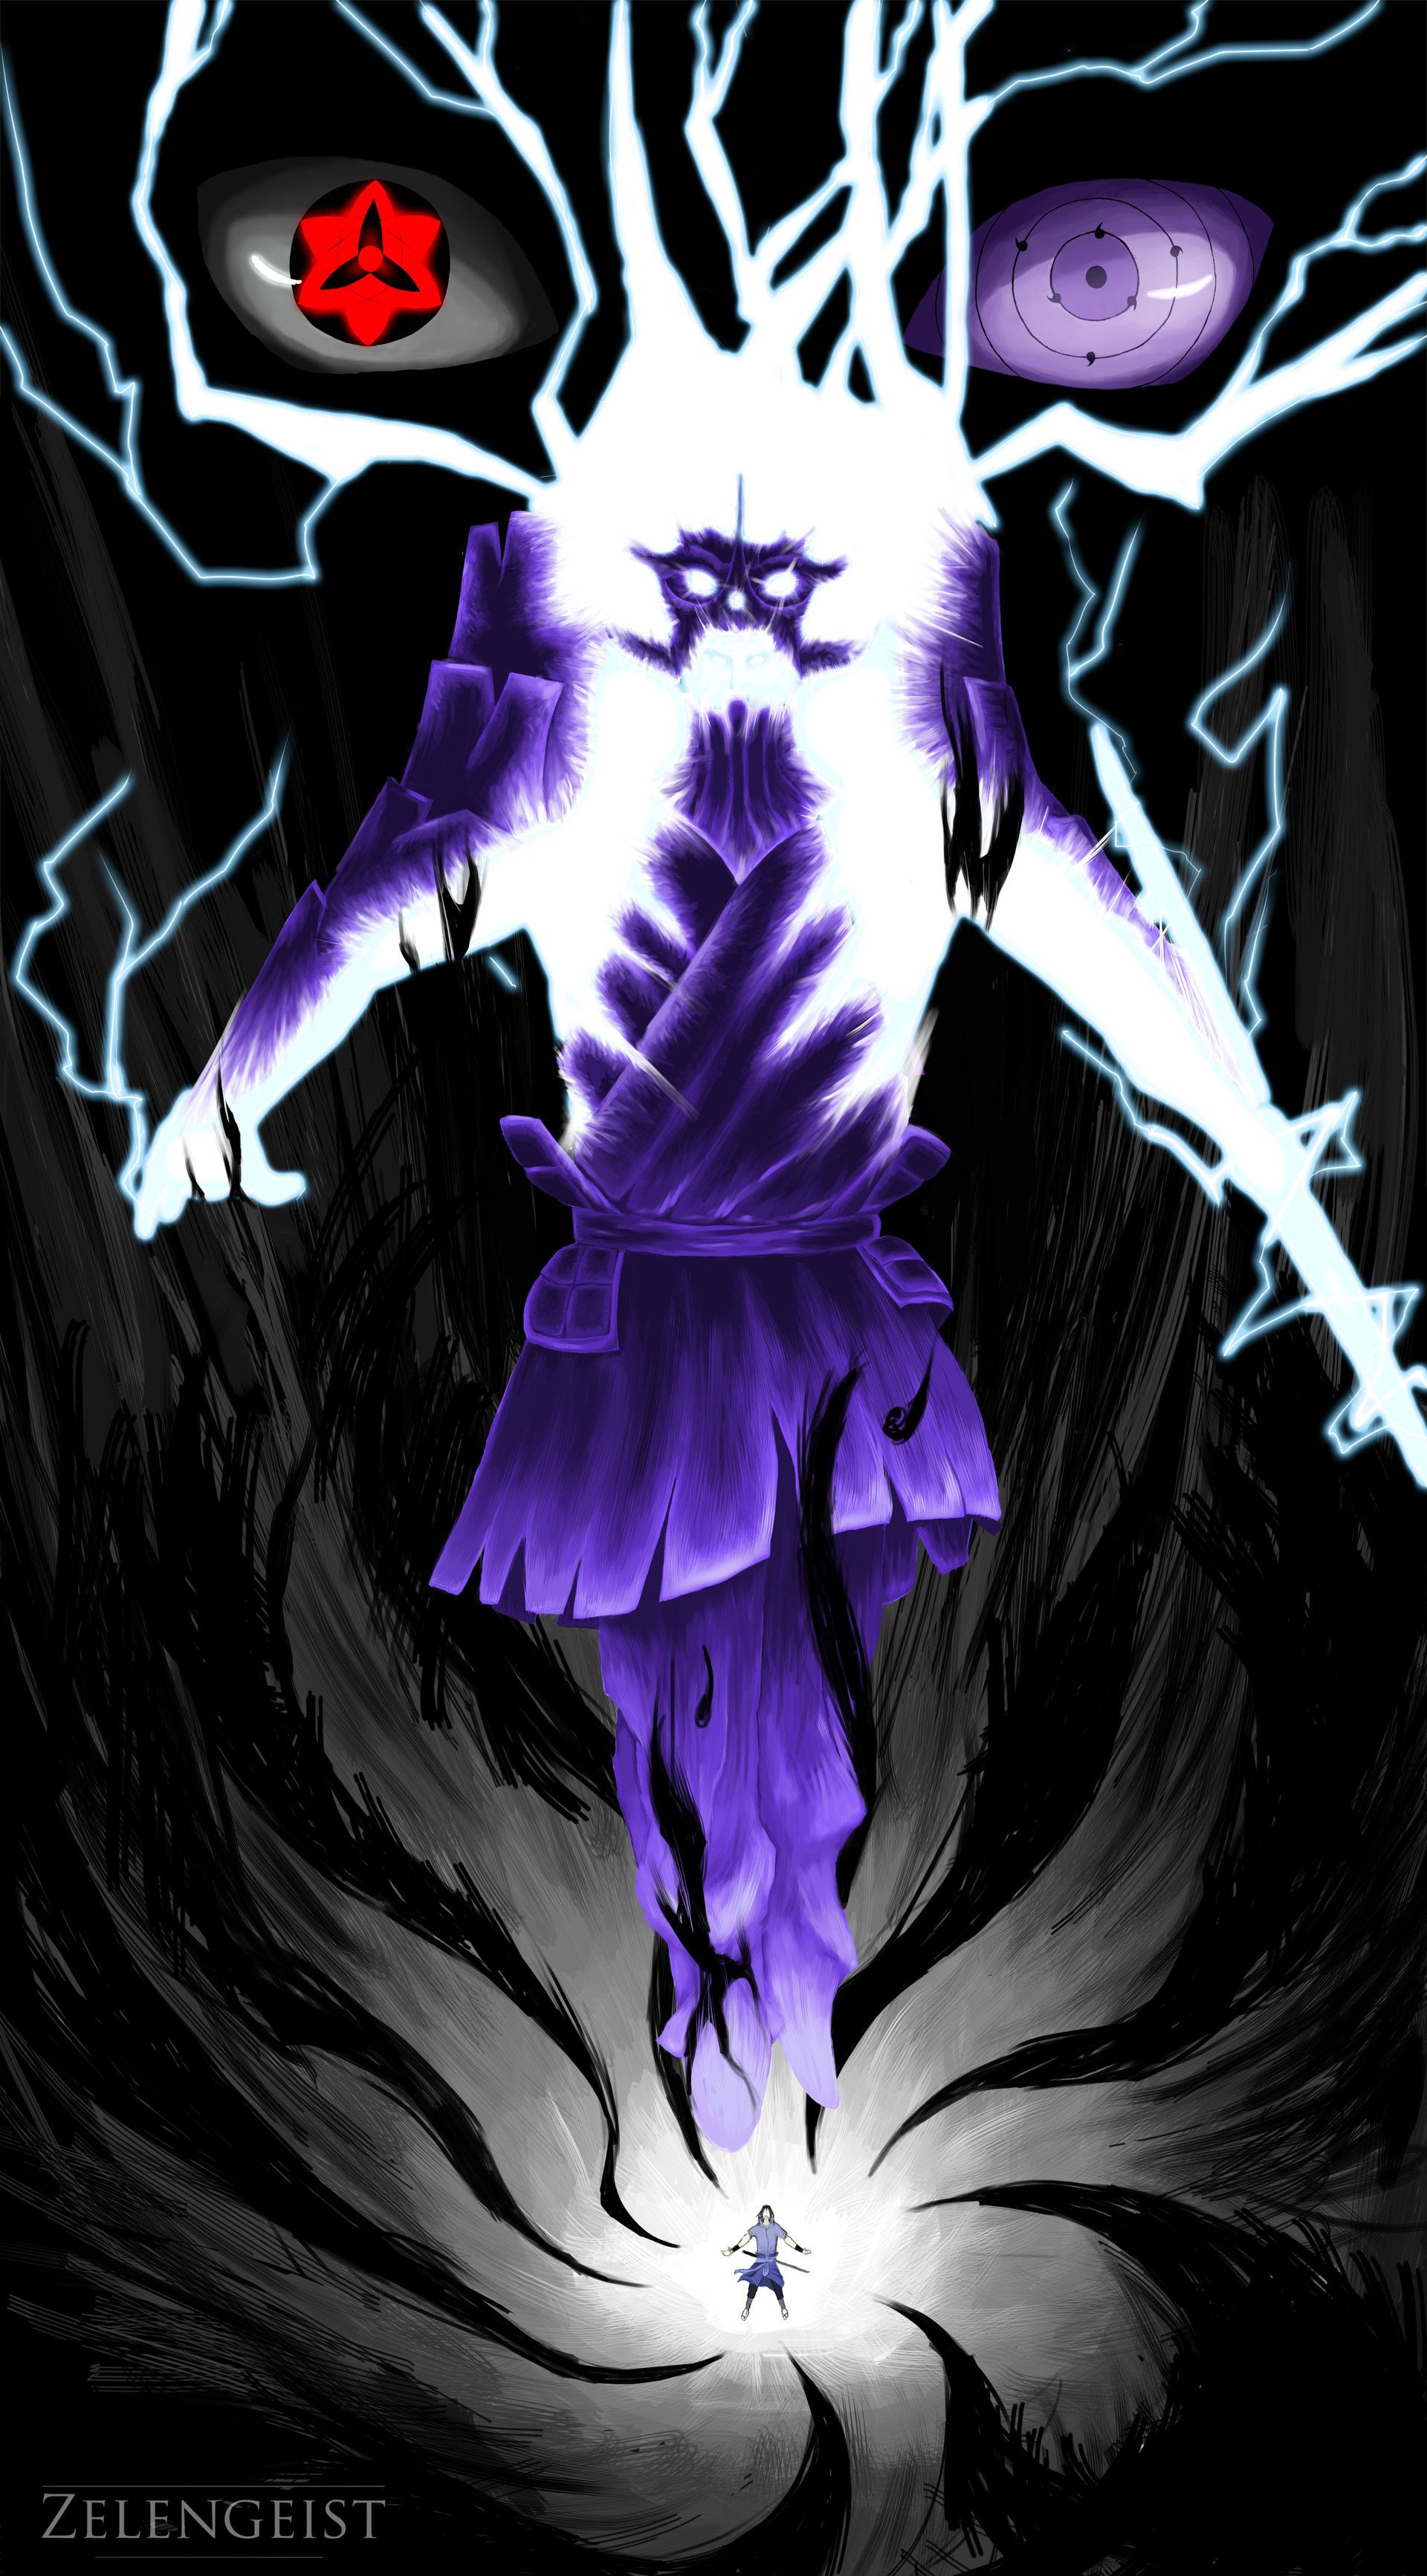 Res: 1920x3467, Sasuke Wallpaper iPhone Fresh Sasuke Entering A Downward Spiral as He  Powers Up His Susanoo Of